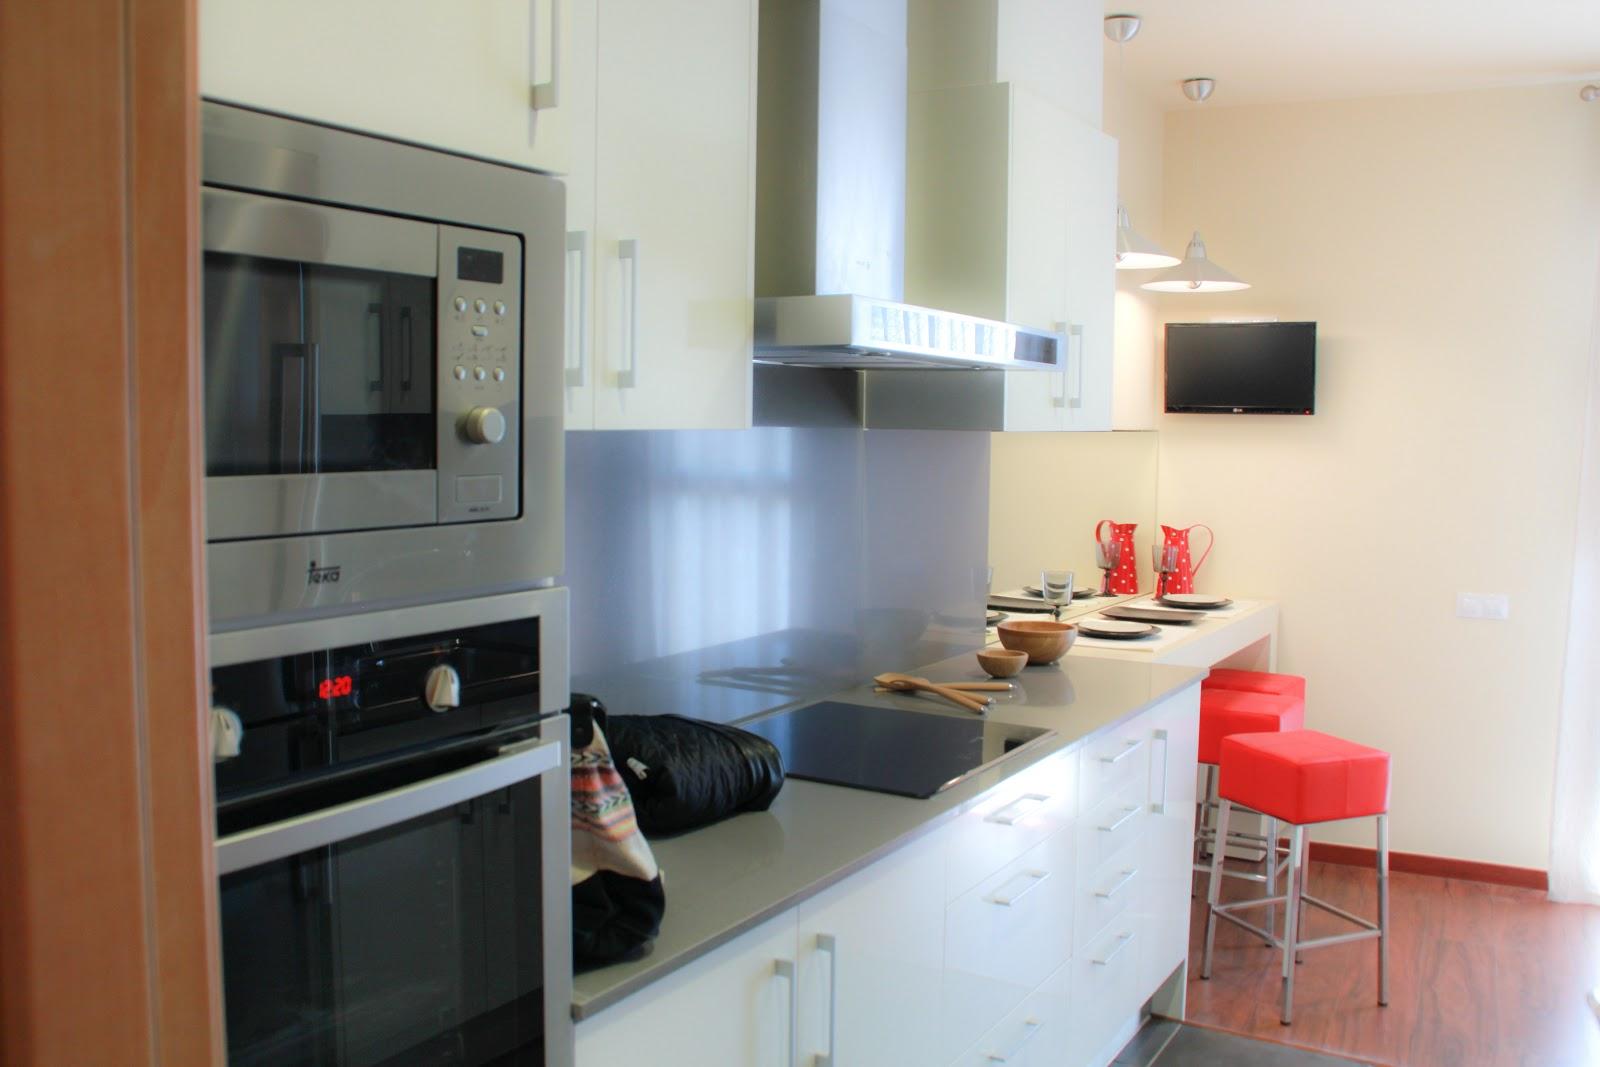 Edificio petrus sant feliu piso muestra petrus sant feliu - Cocina office ...